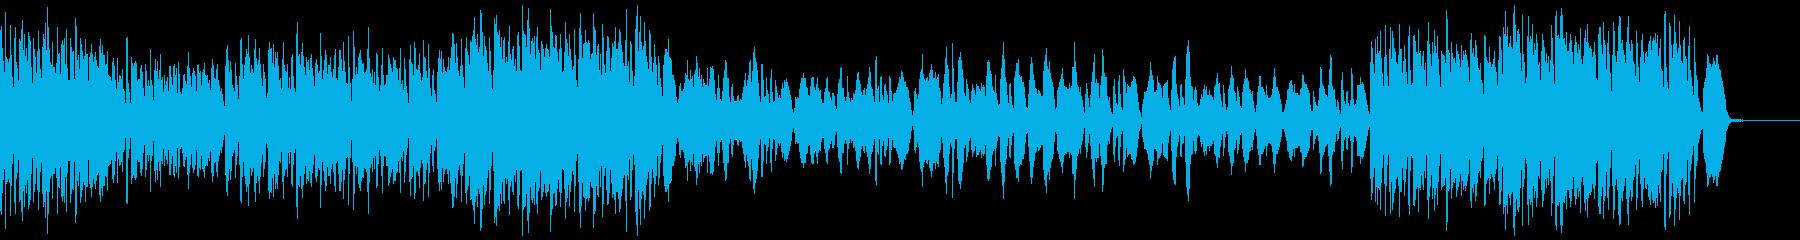 BWV1066/5『メヌエット』バッハの再生済みの波形